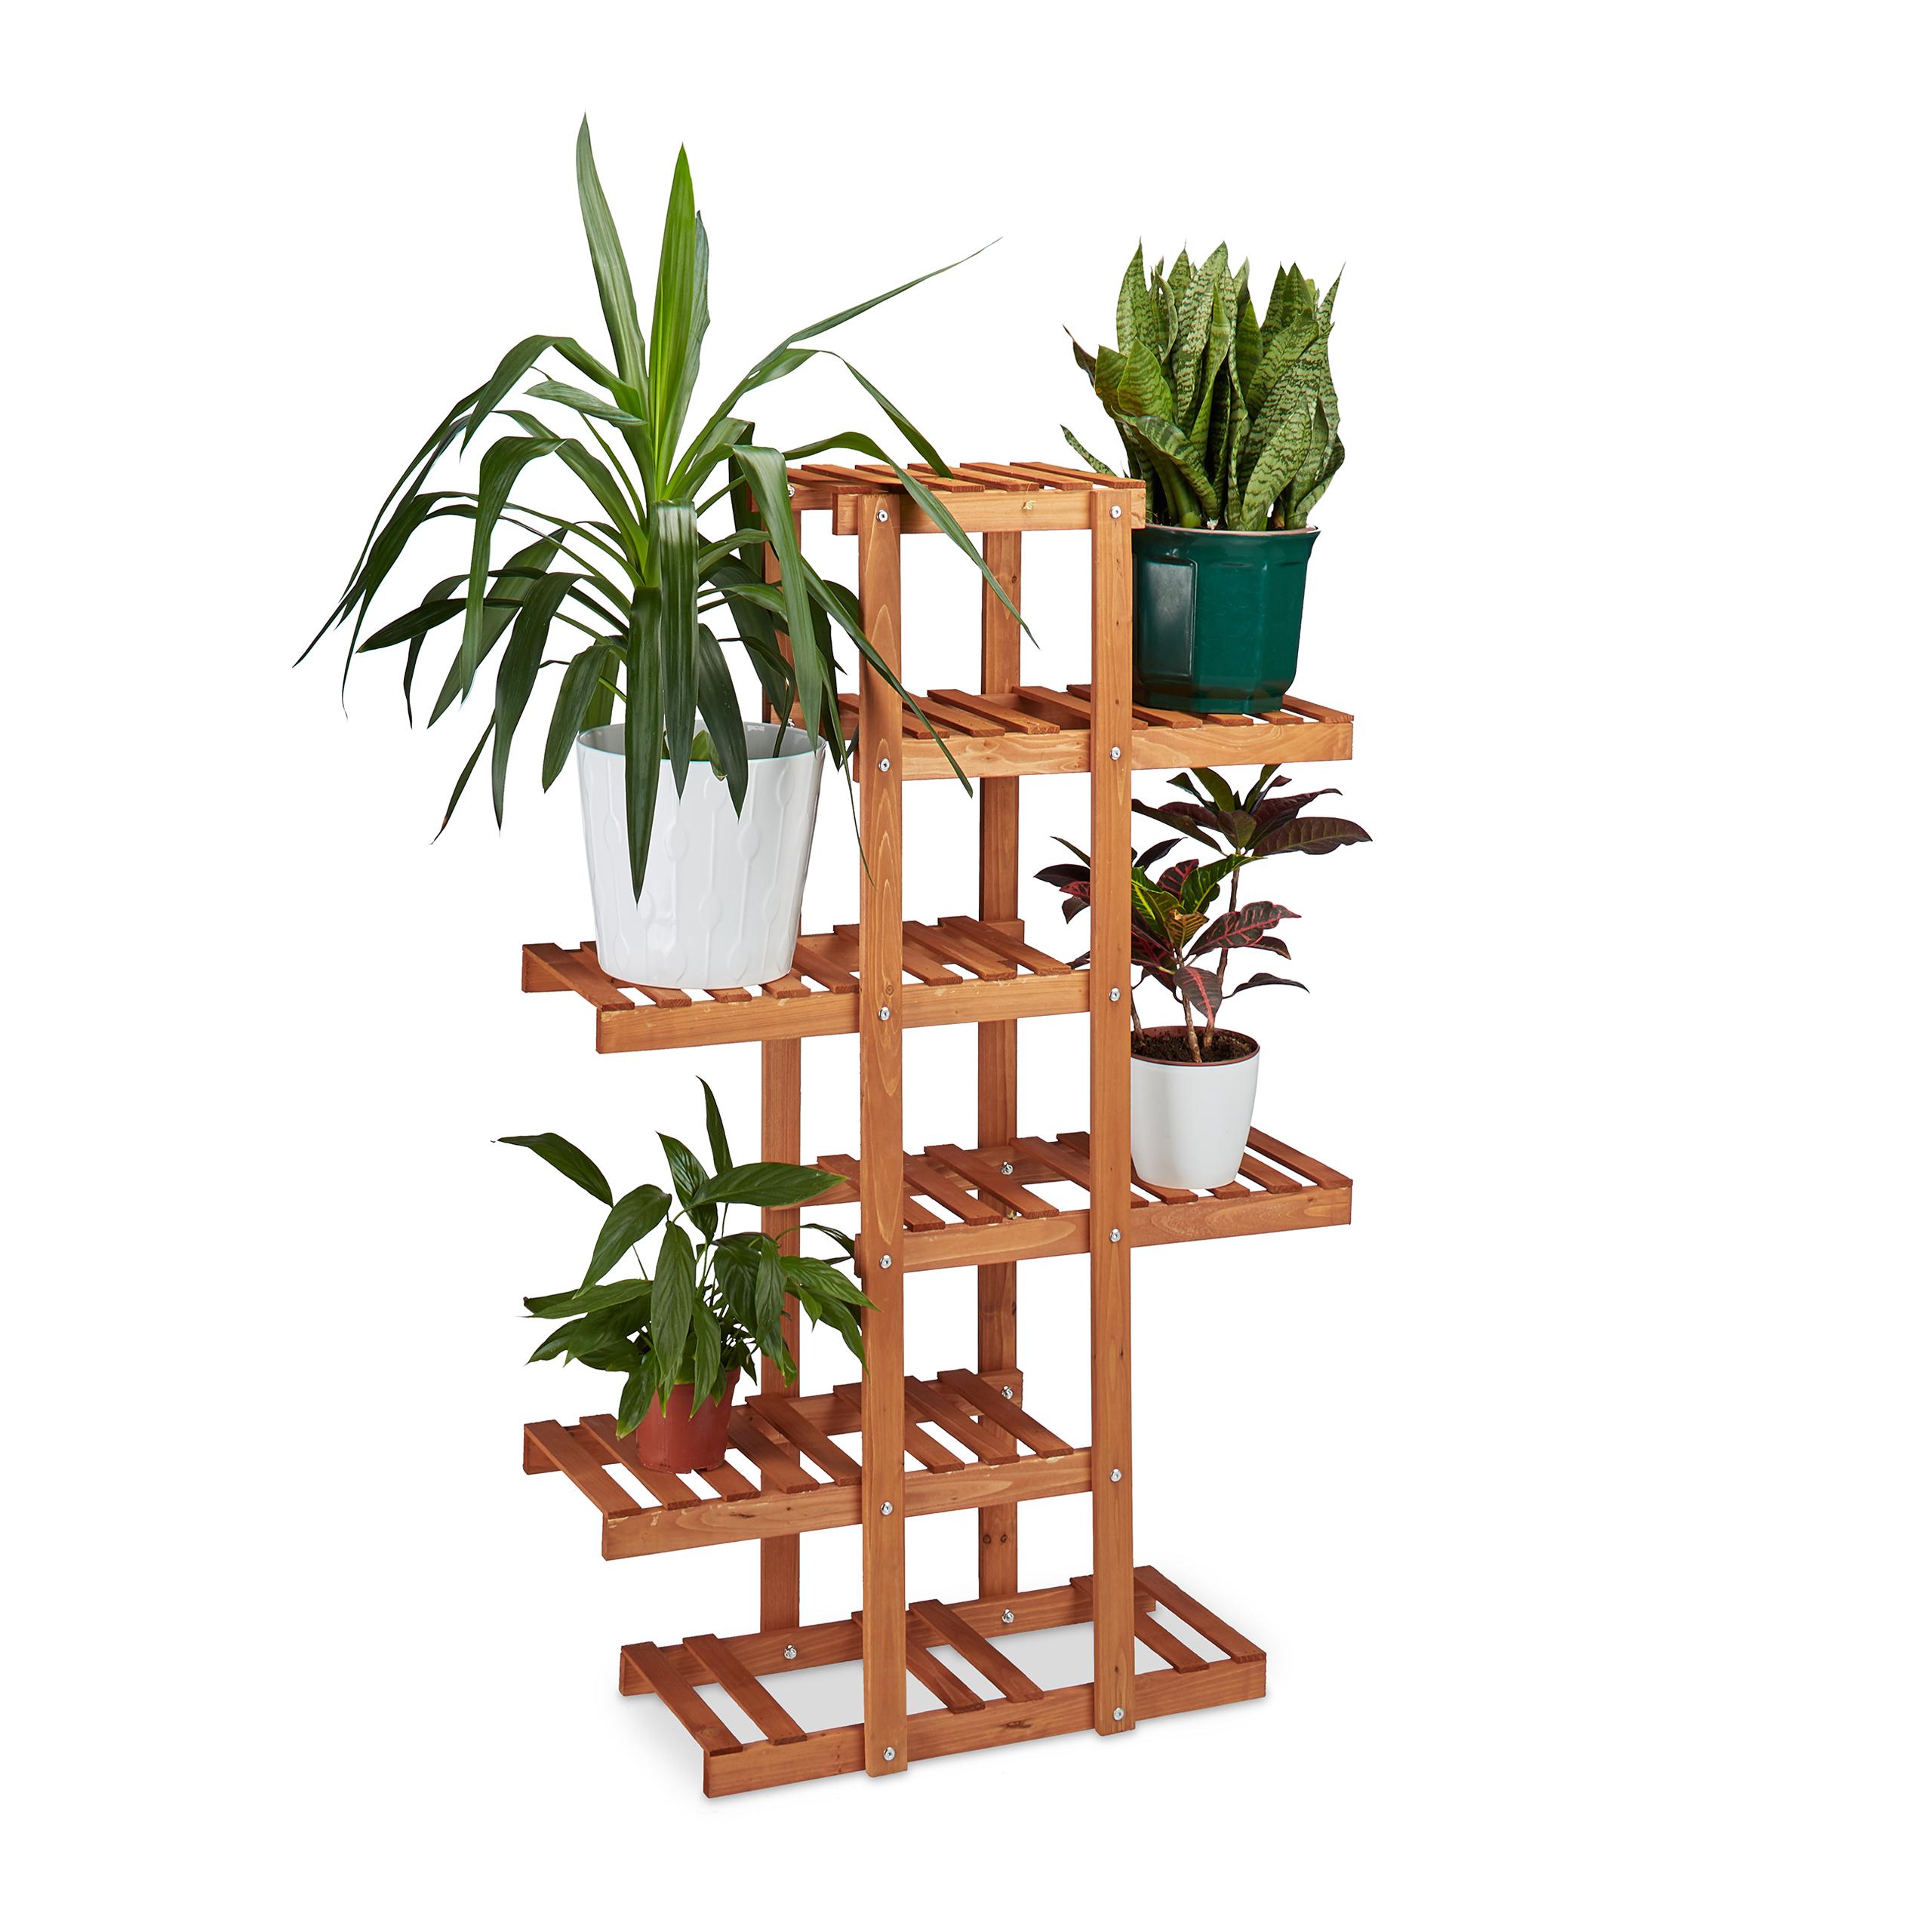 Blumenregal holz etagere f r blumen gro e pflanzentreppe 5 for Fioriera a scala